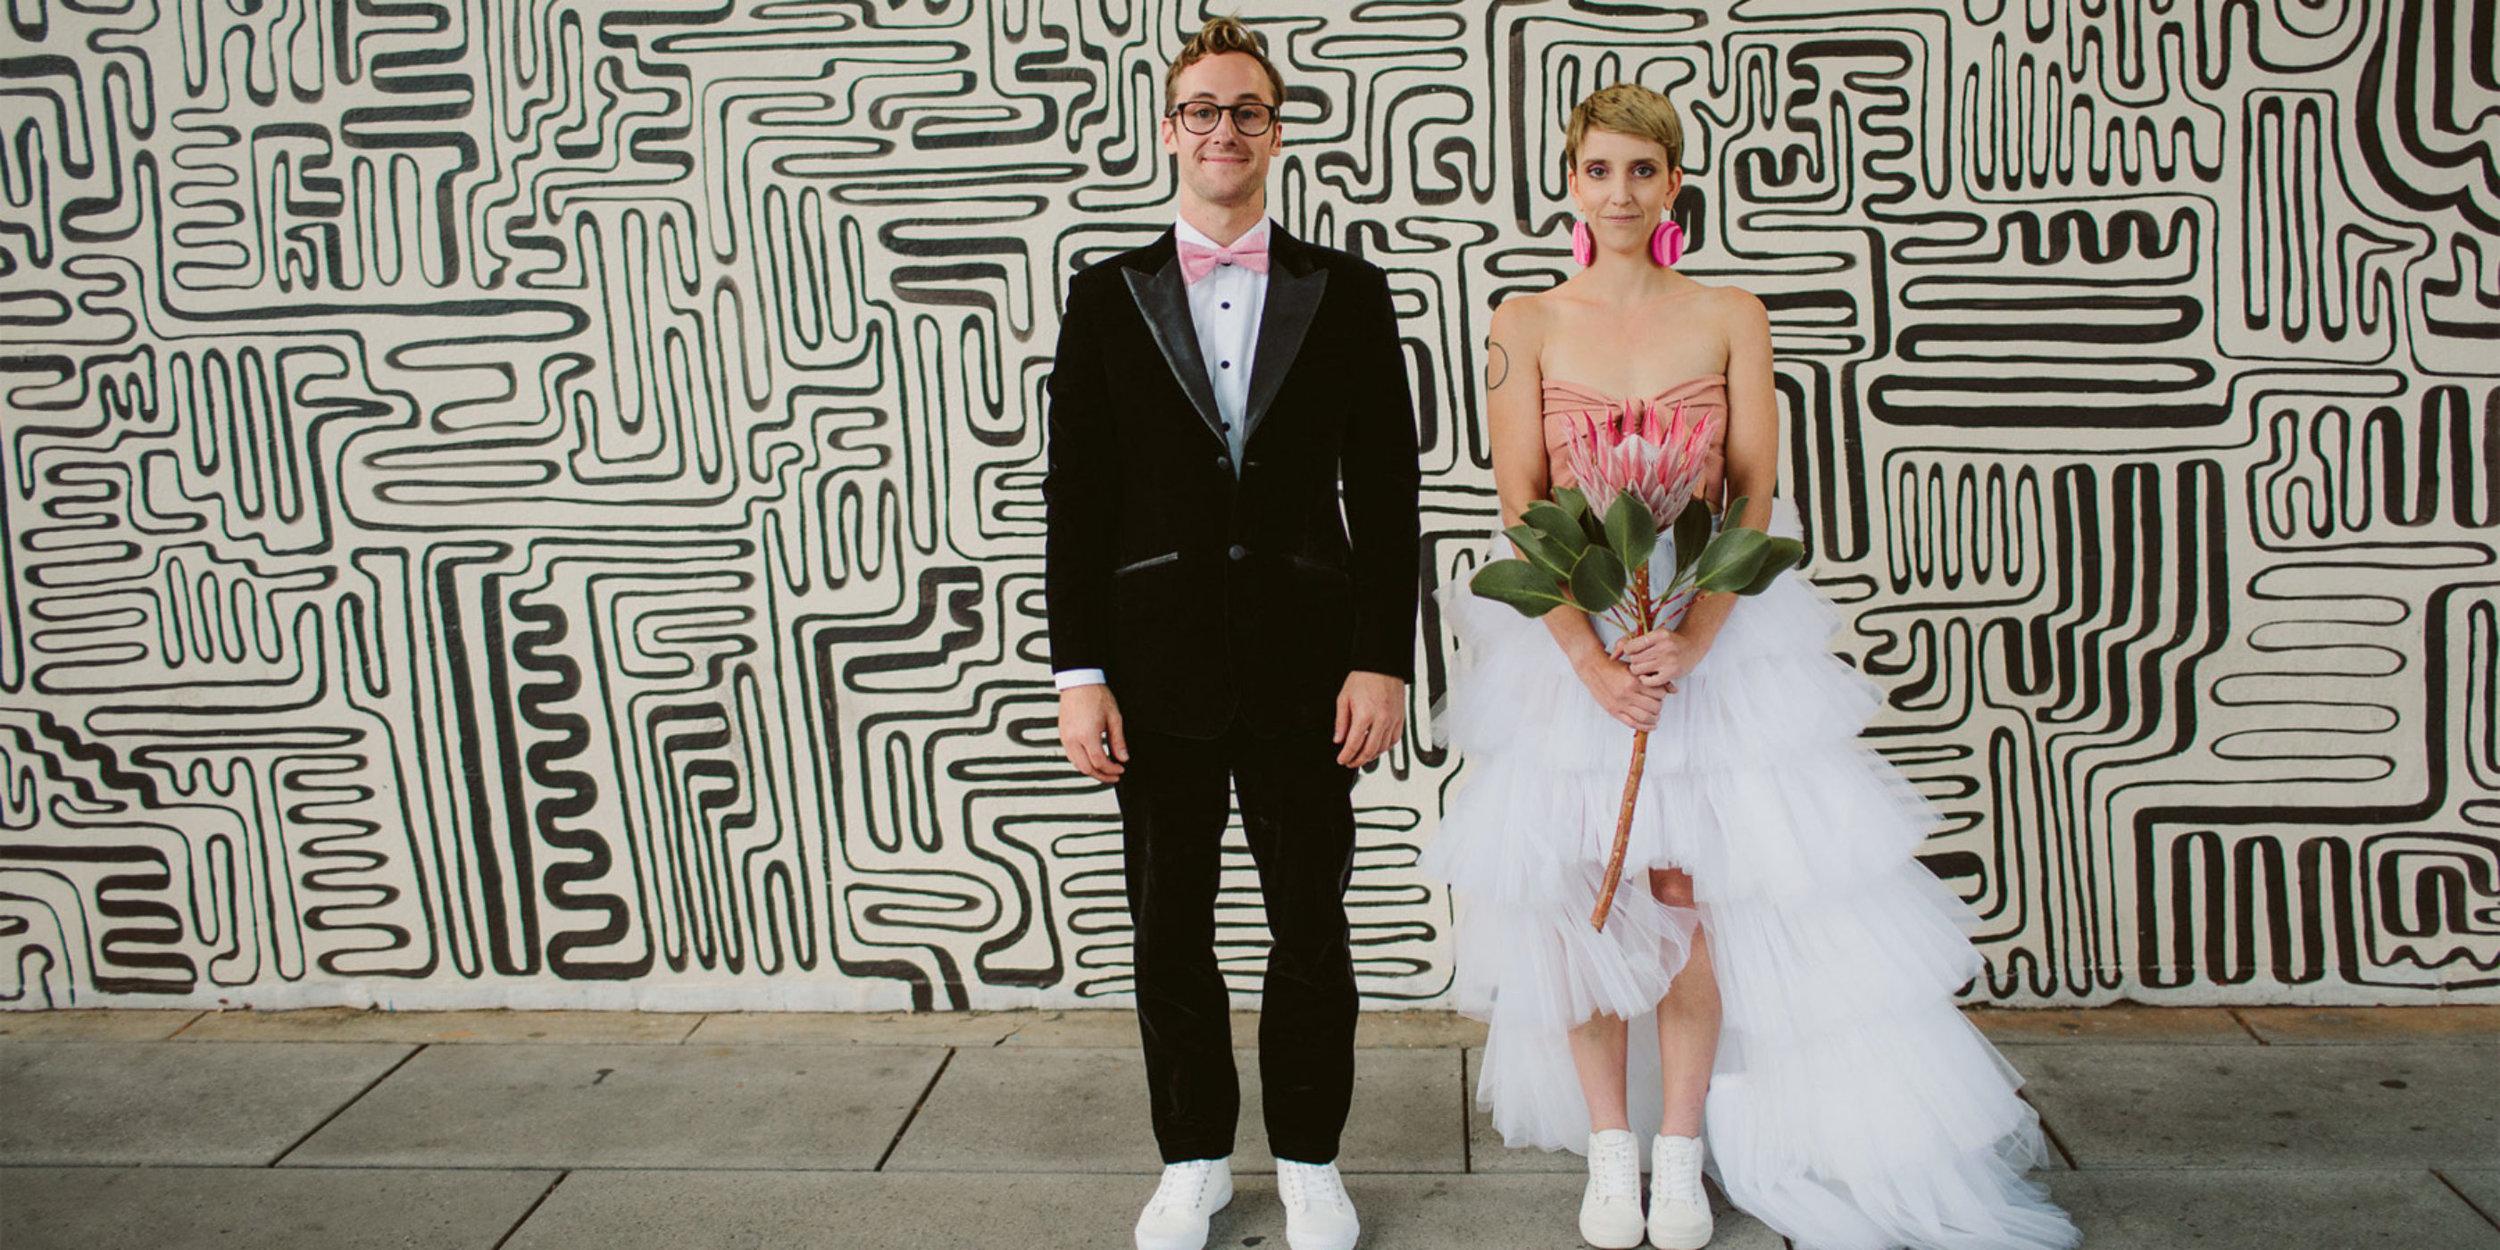 adelaide-warehouse-party-wedding-01-2800x1400-c-center.jpg